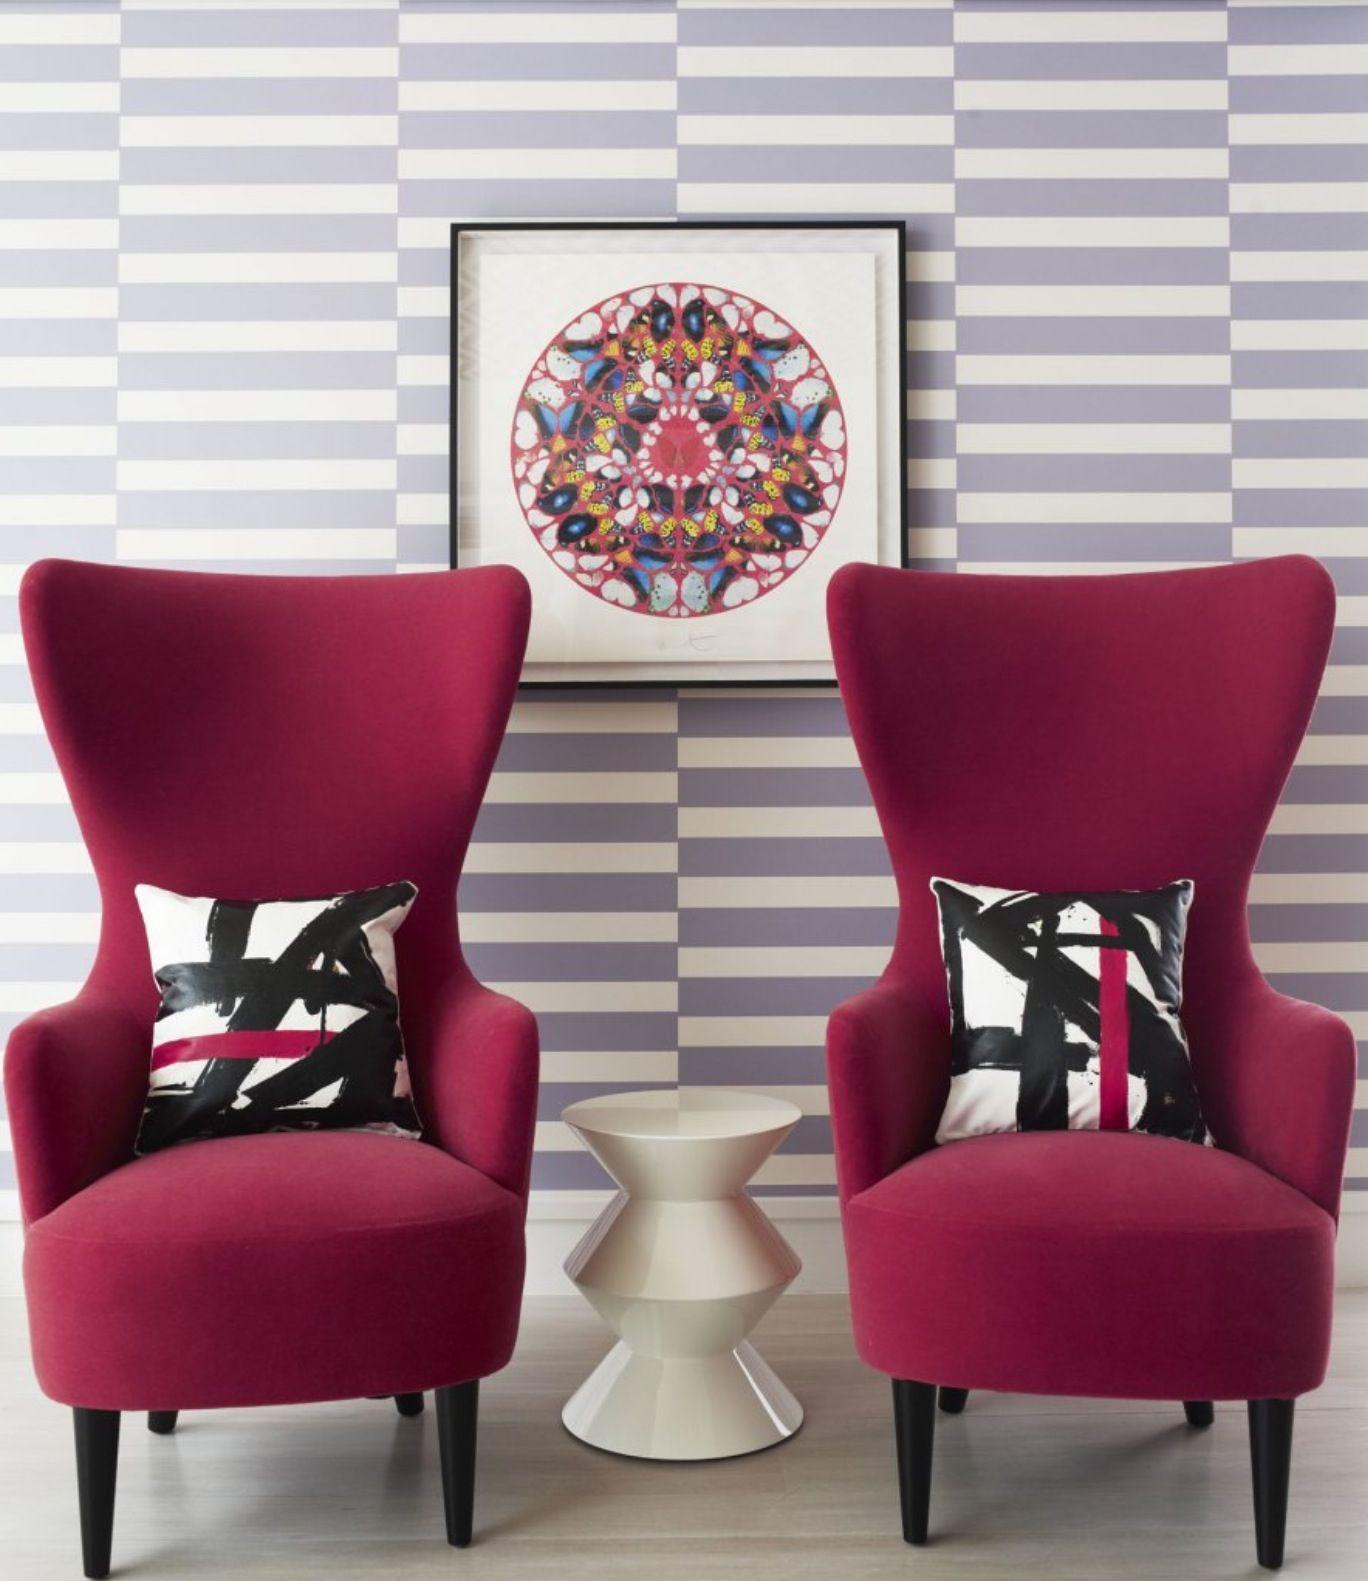 greg natale raspberry lavender arts designs